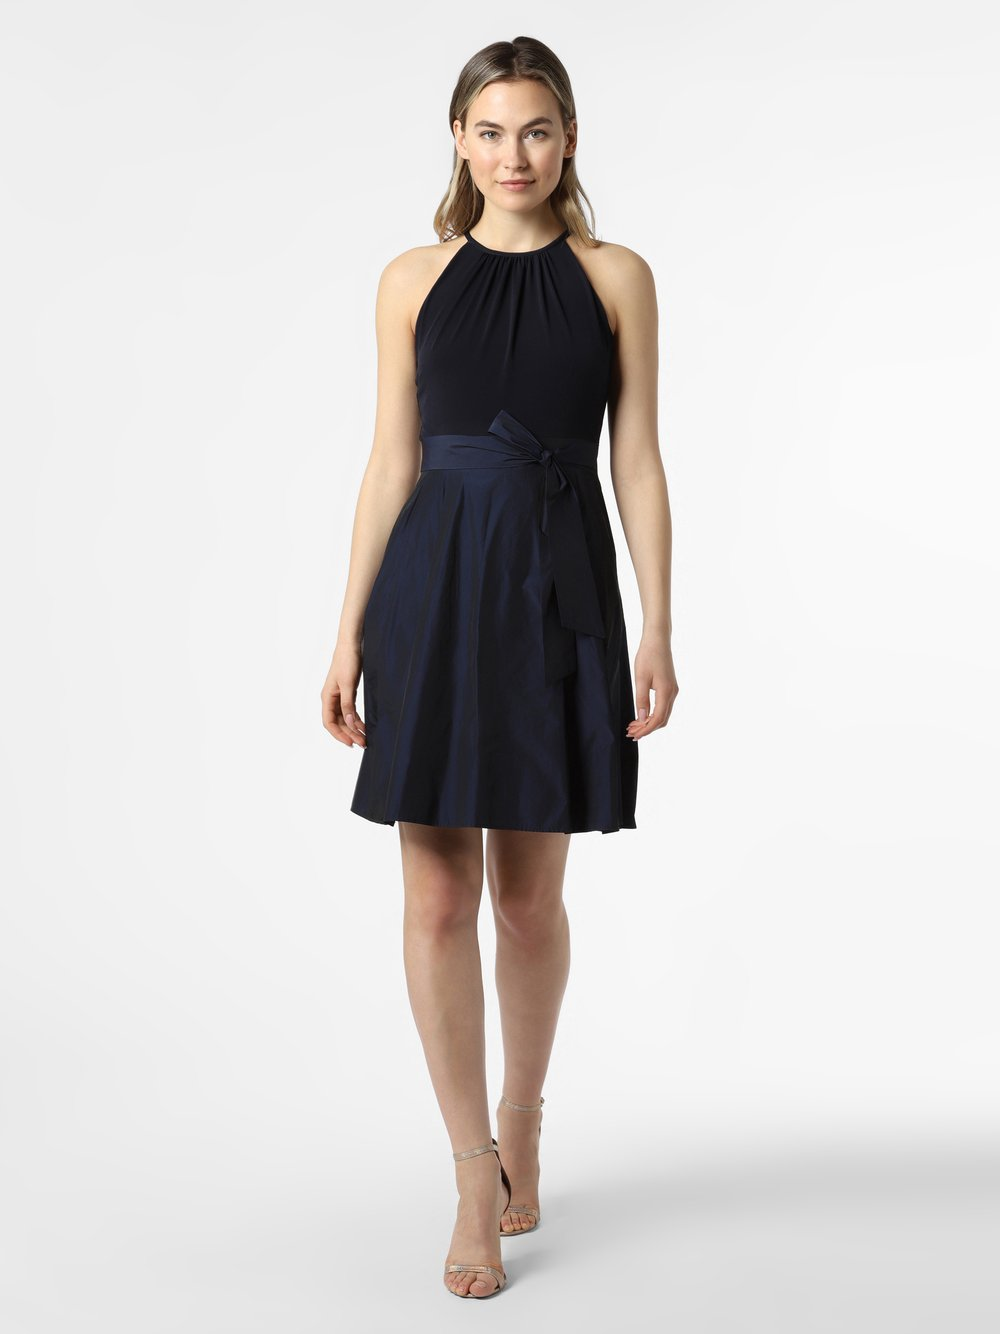 VM - Damska sukienka wieczorowa, niebieski